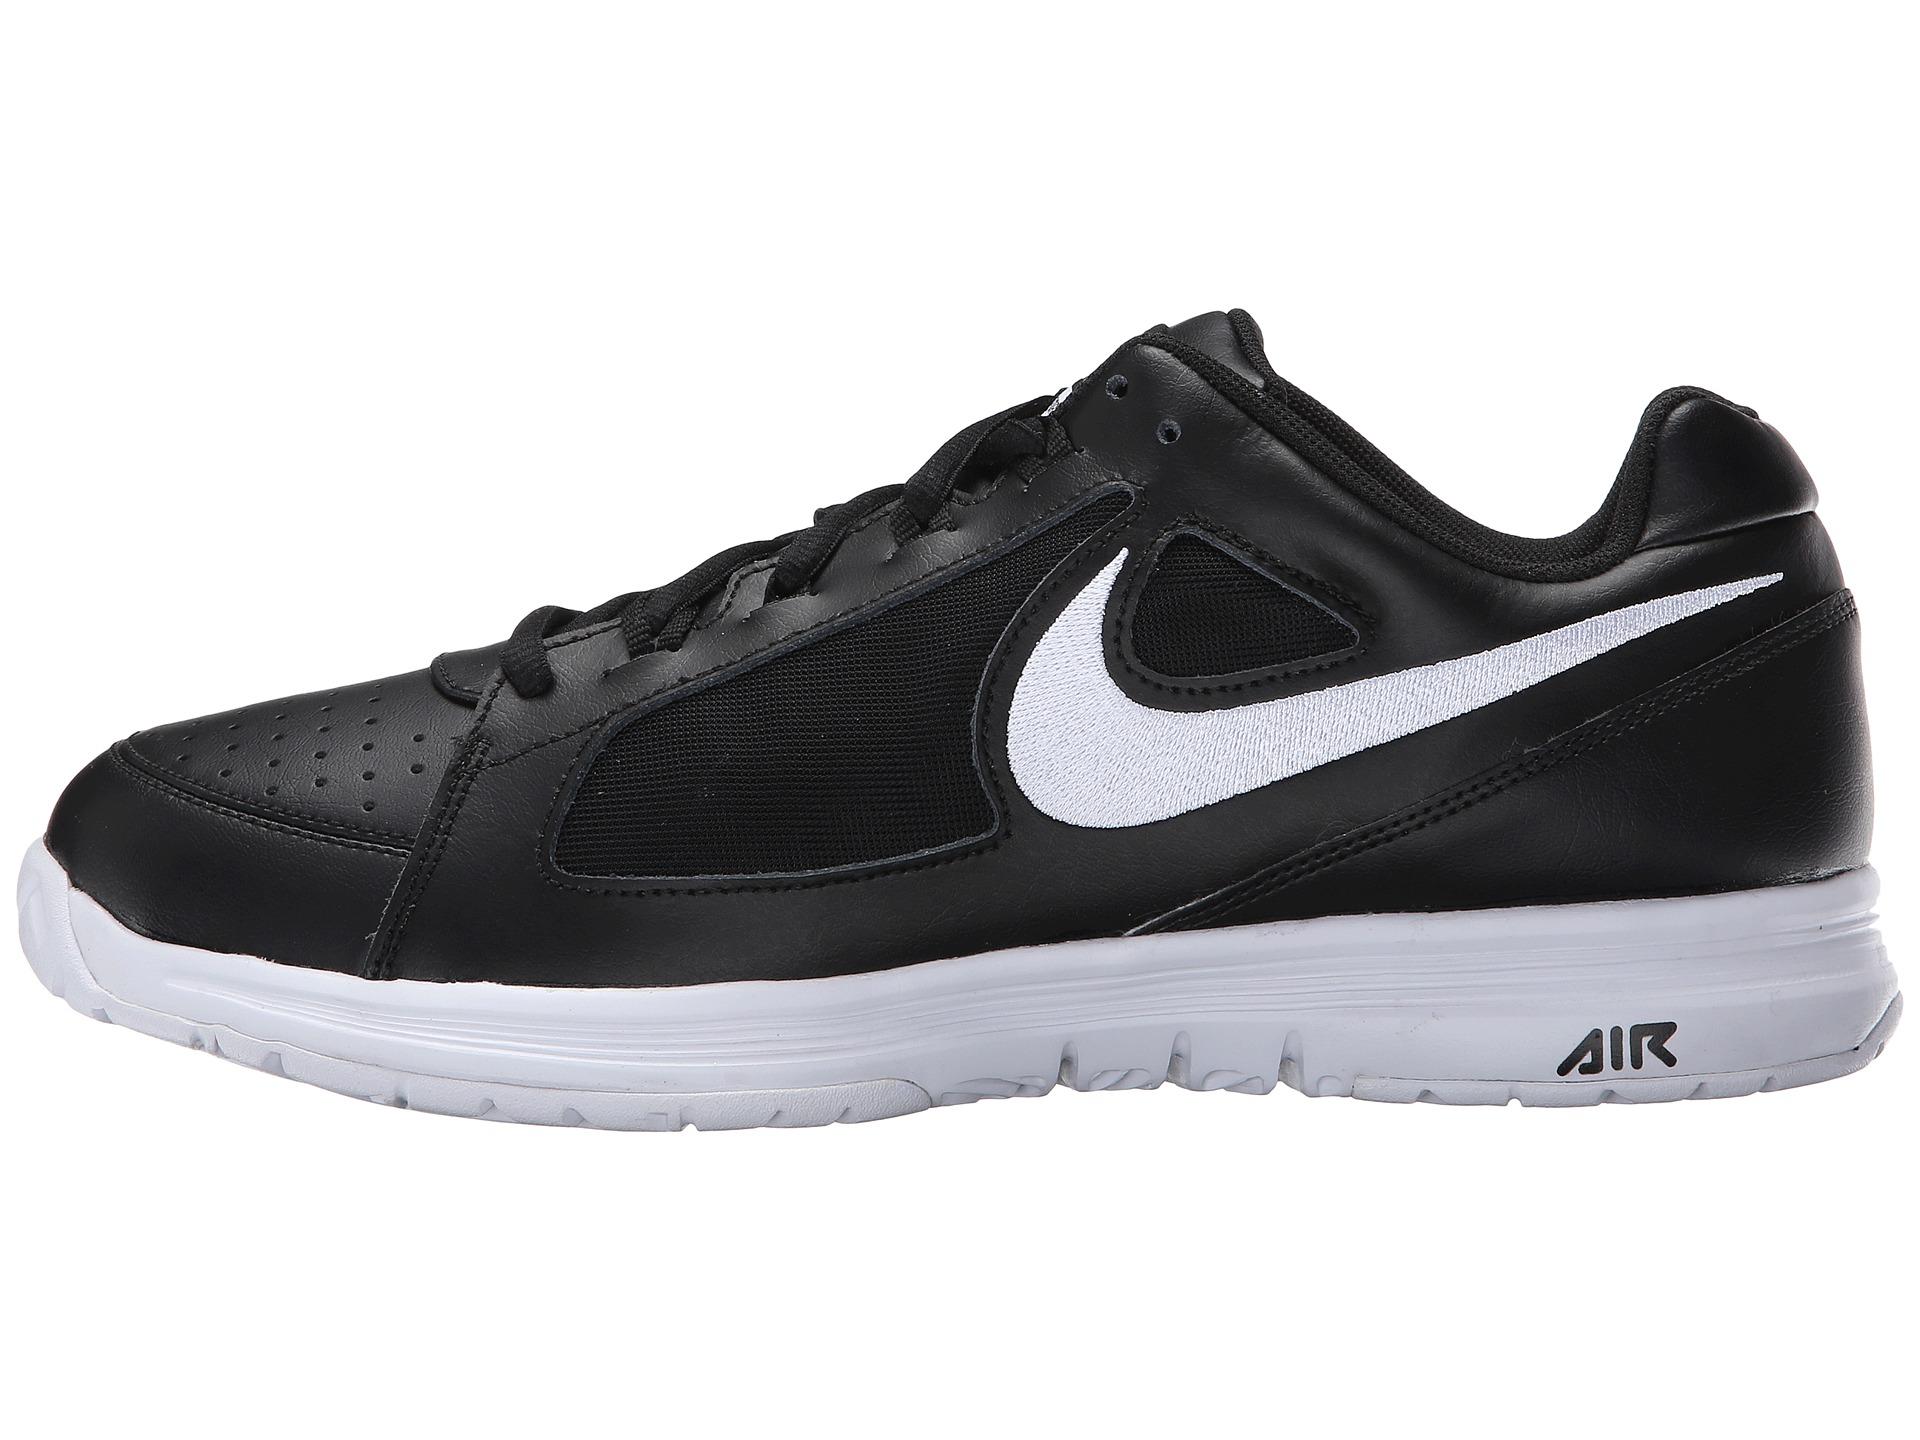 Nike Air Vapor Ace Men S Tennis Shoes Weight